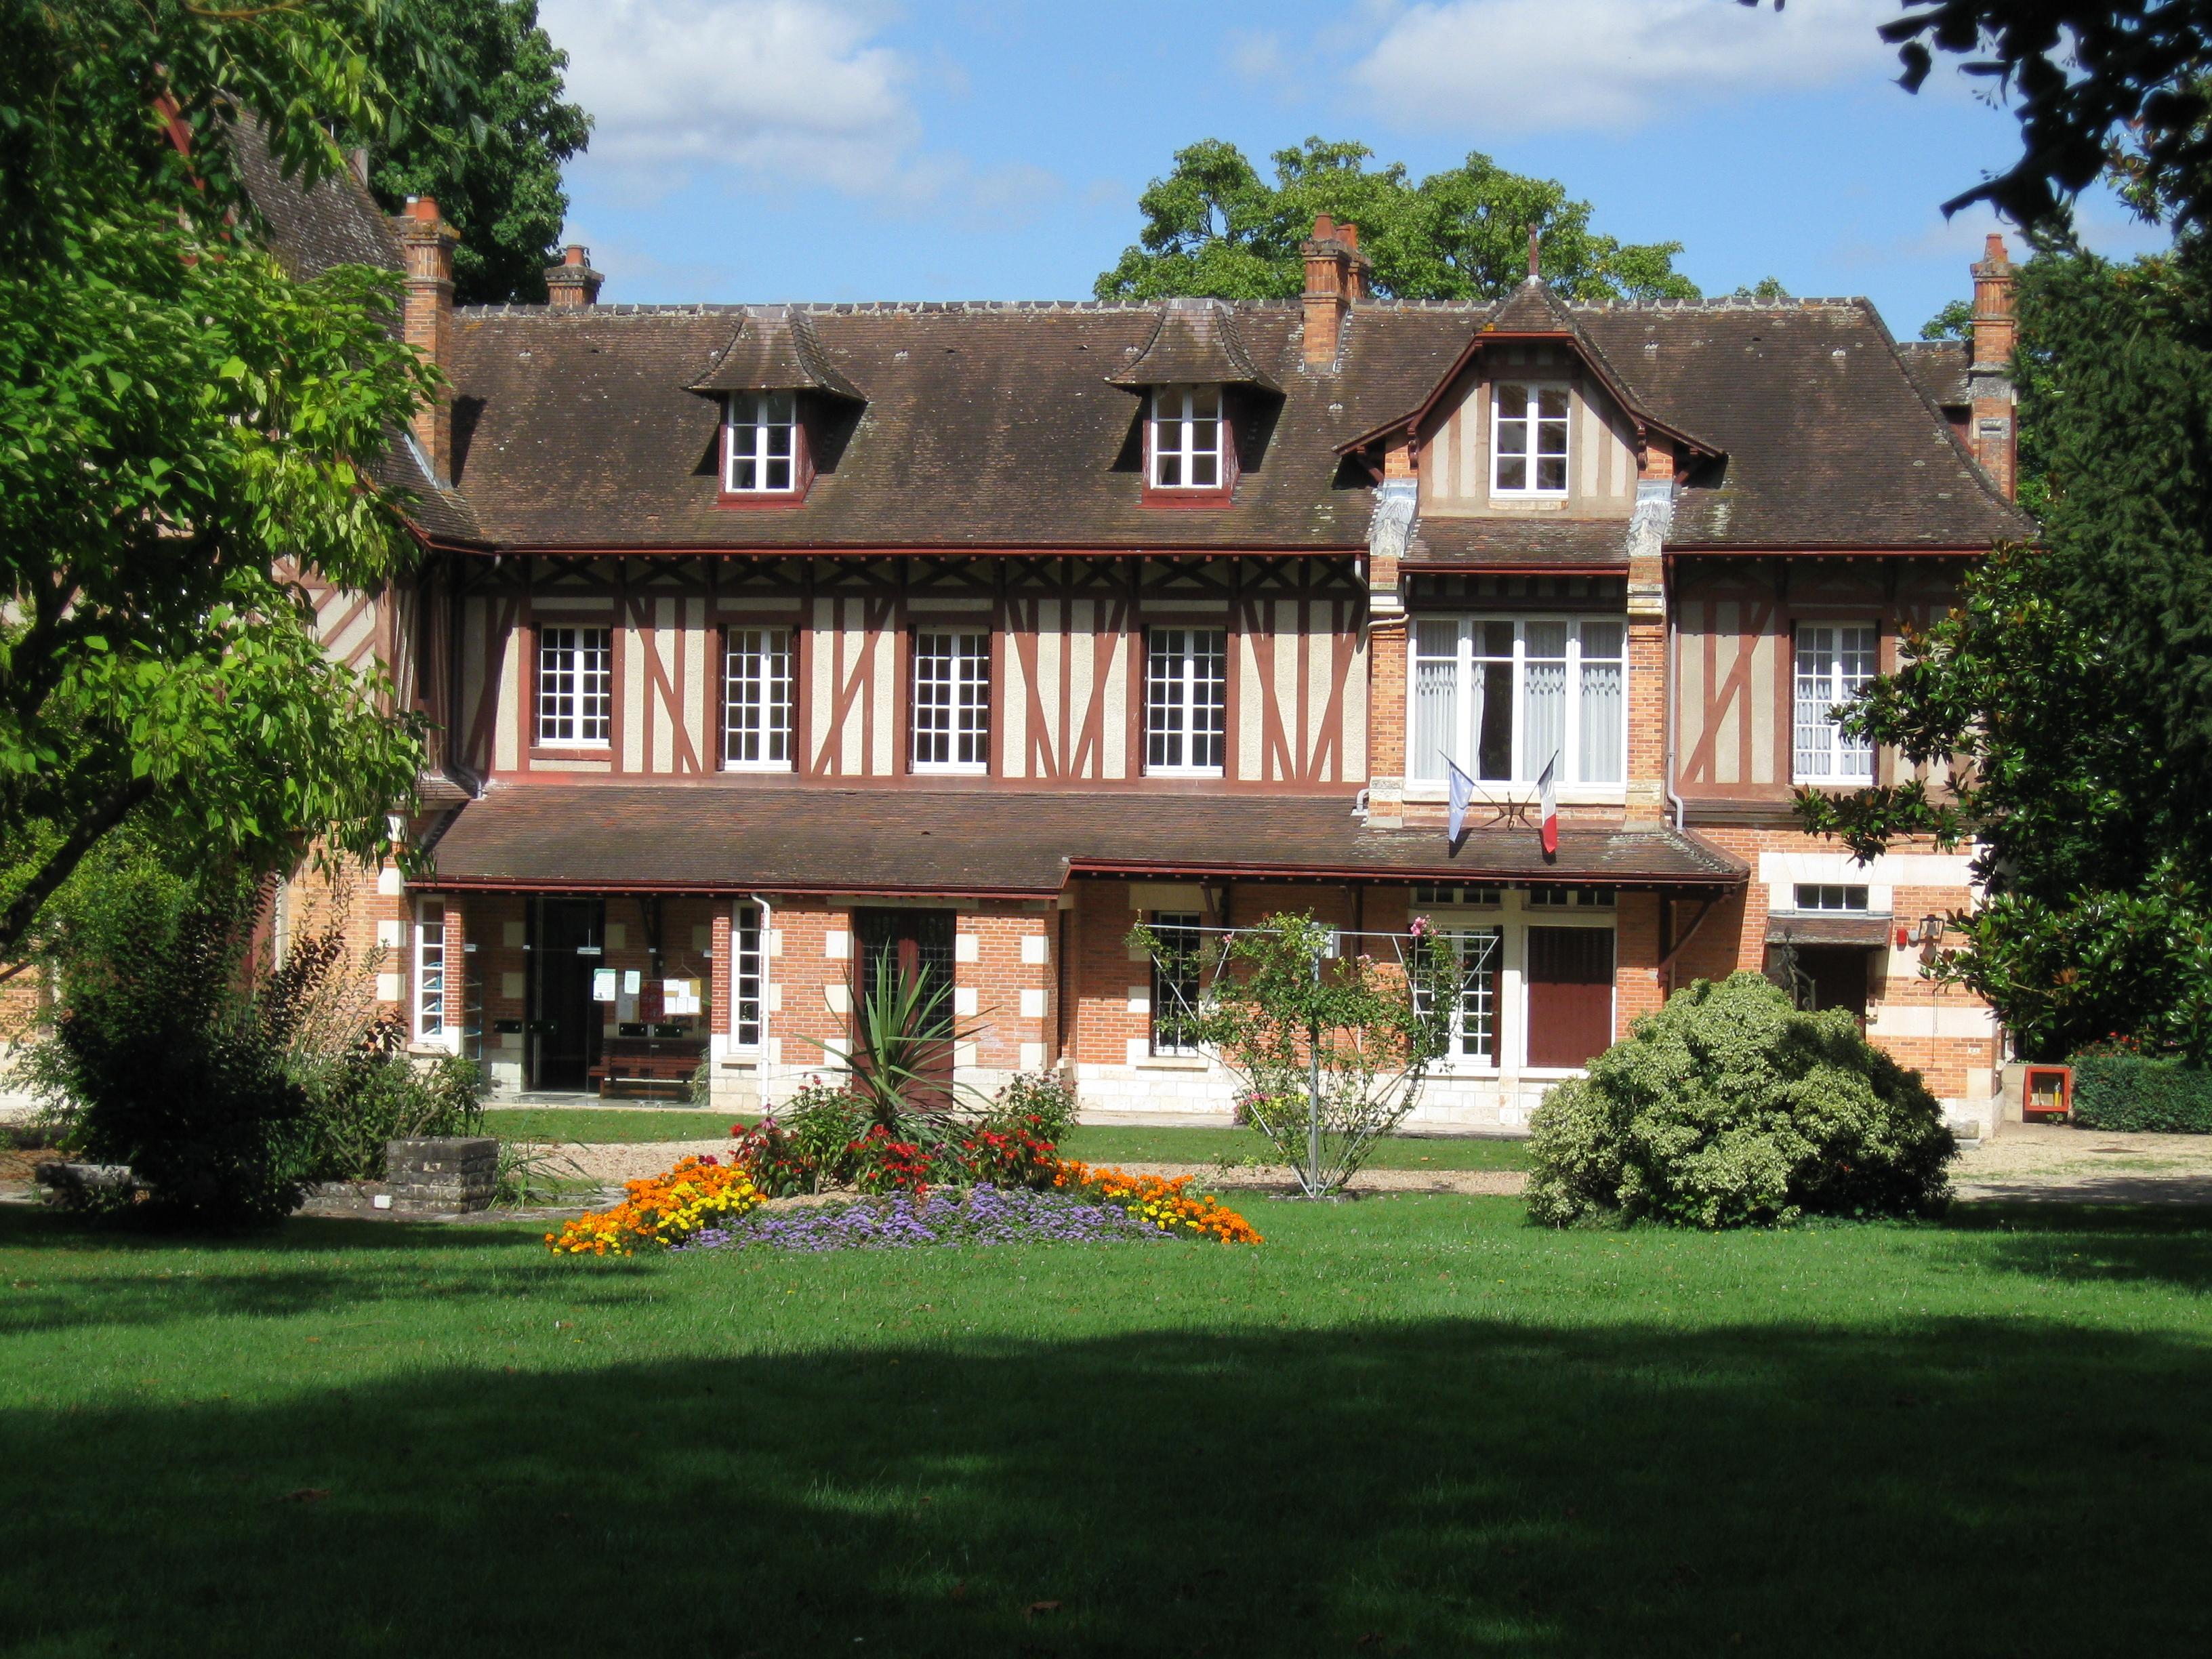 Architecte La Varenne St Hilaire saint-hilaire-saint-mesmin - wikipedia